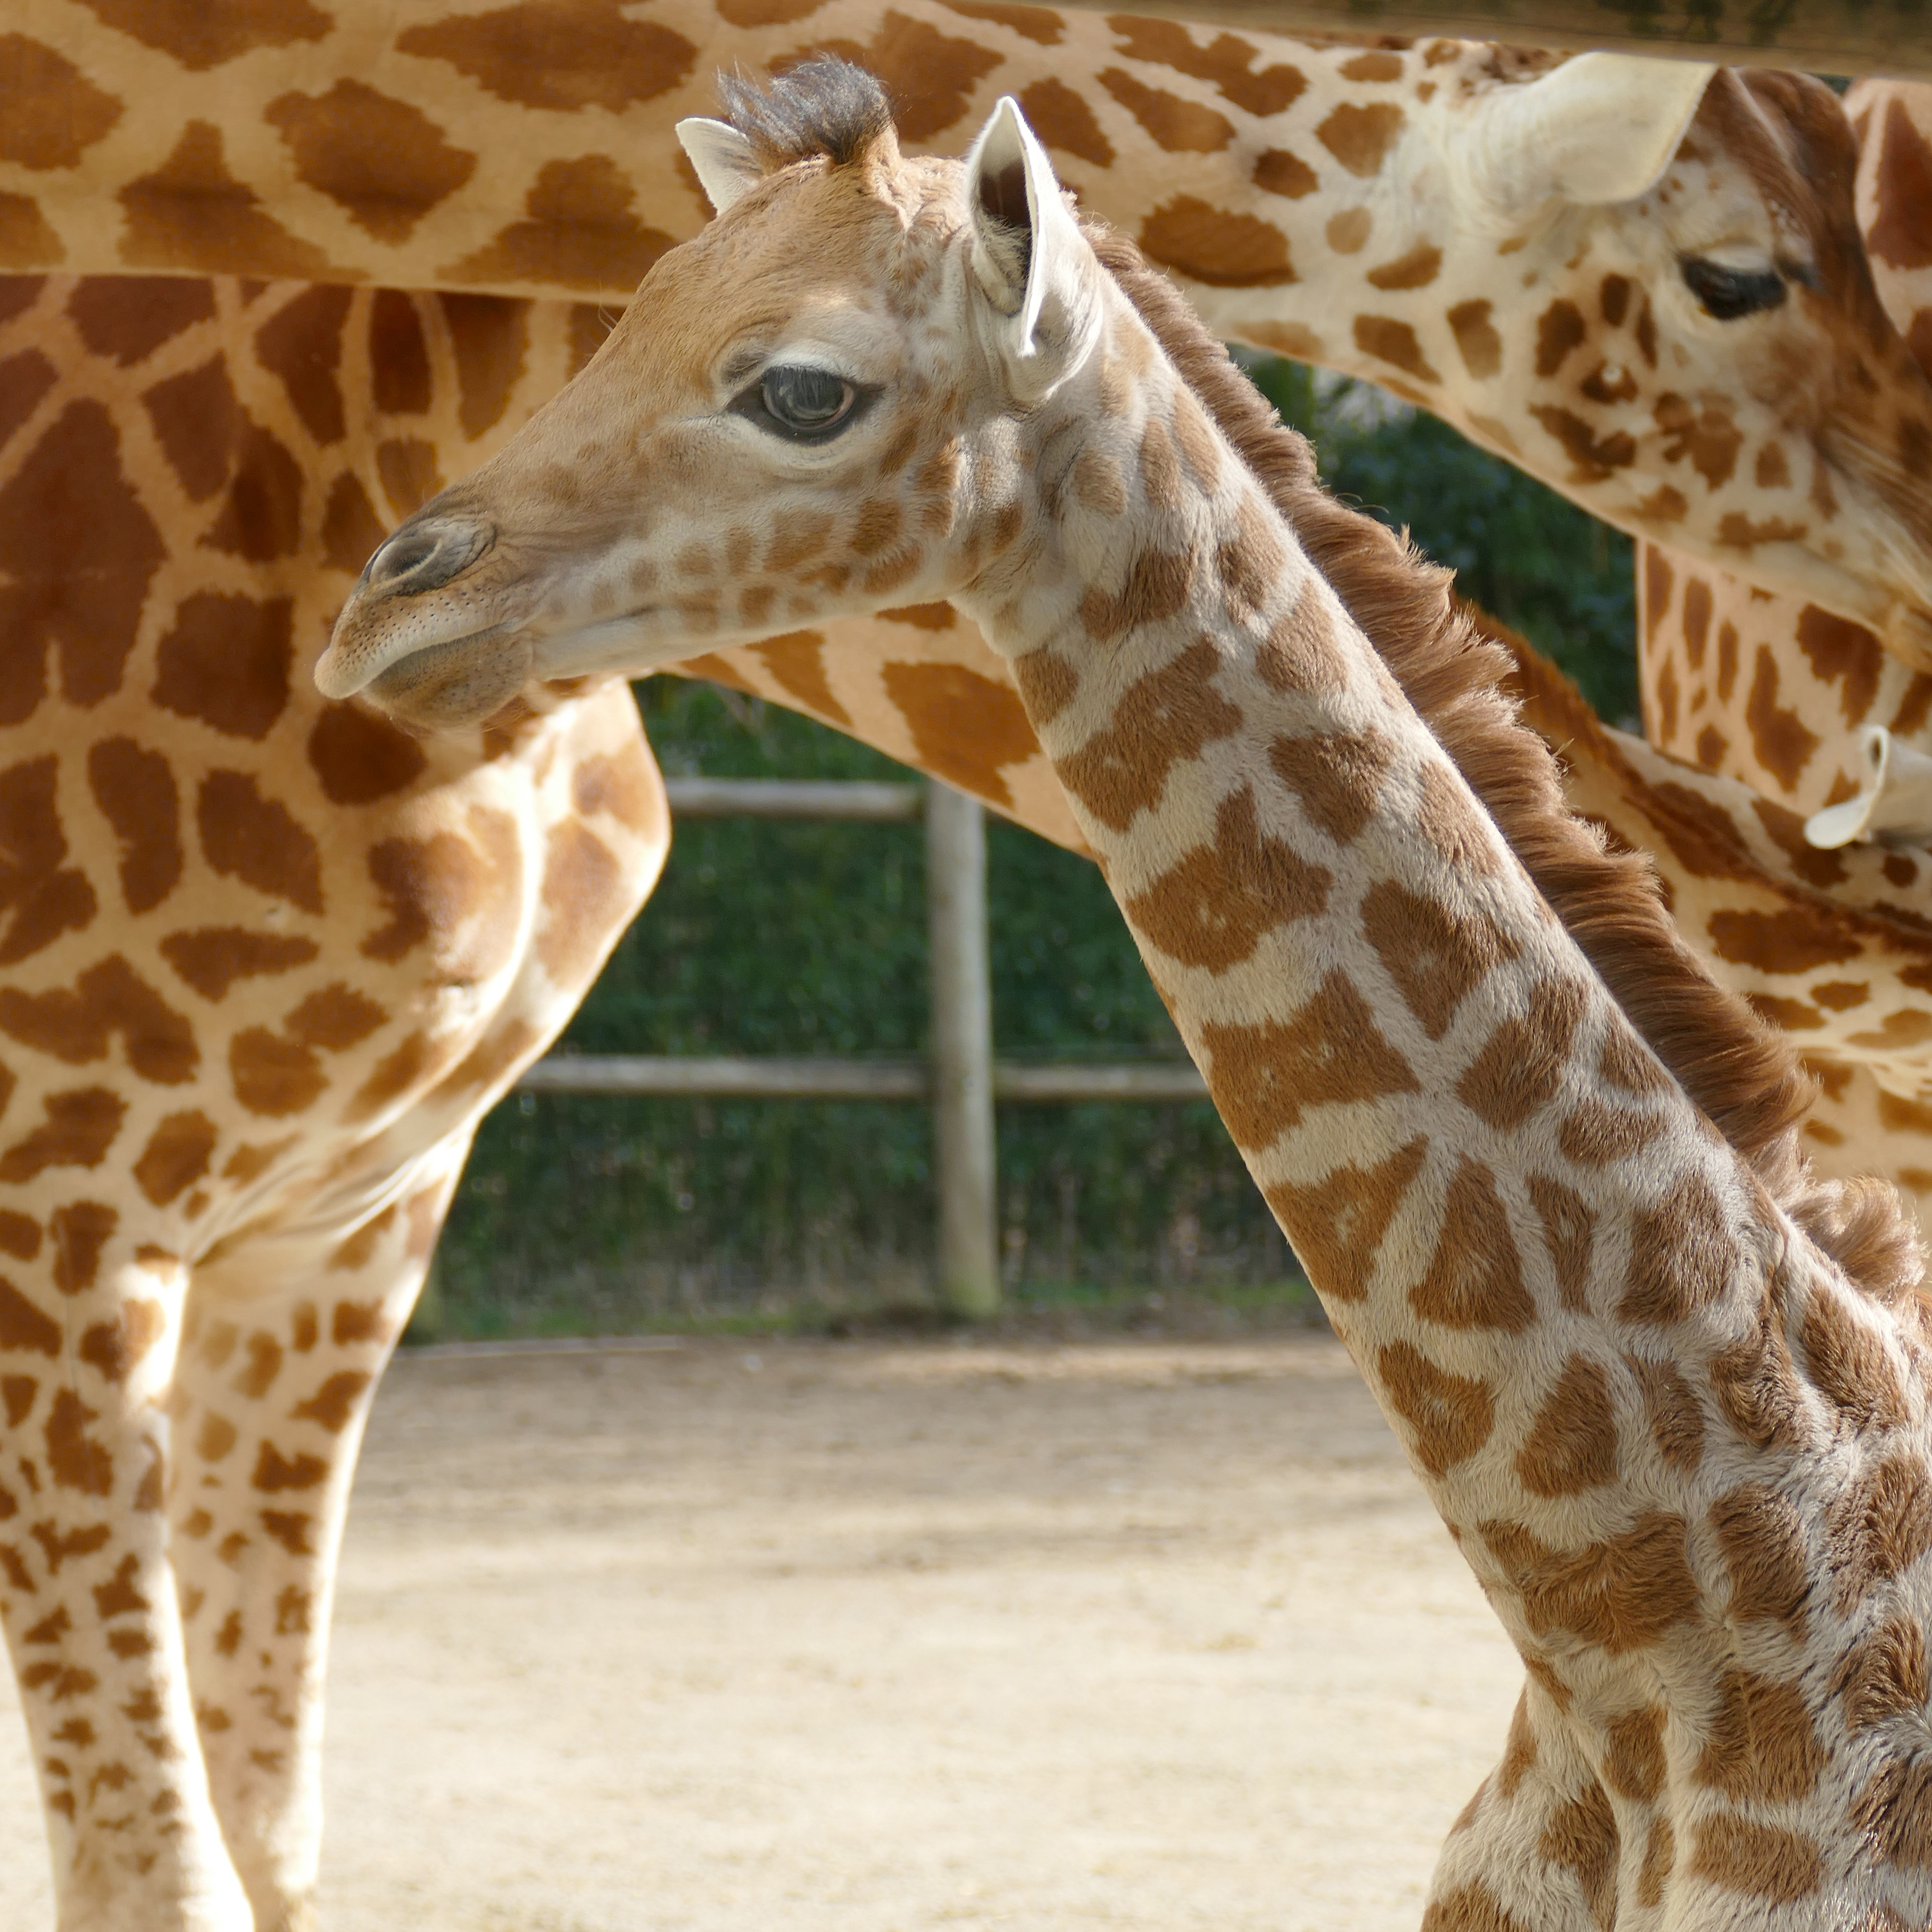 MOUNDOU, a Kordofan giraffe